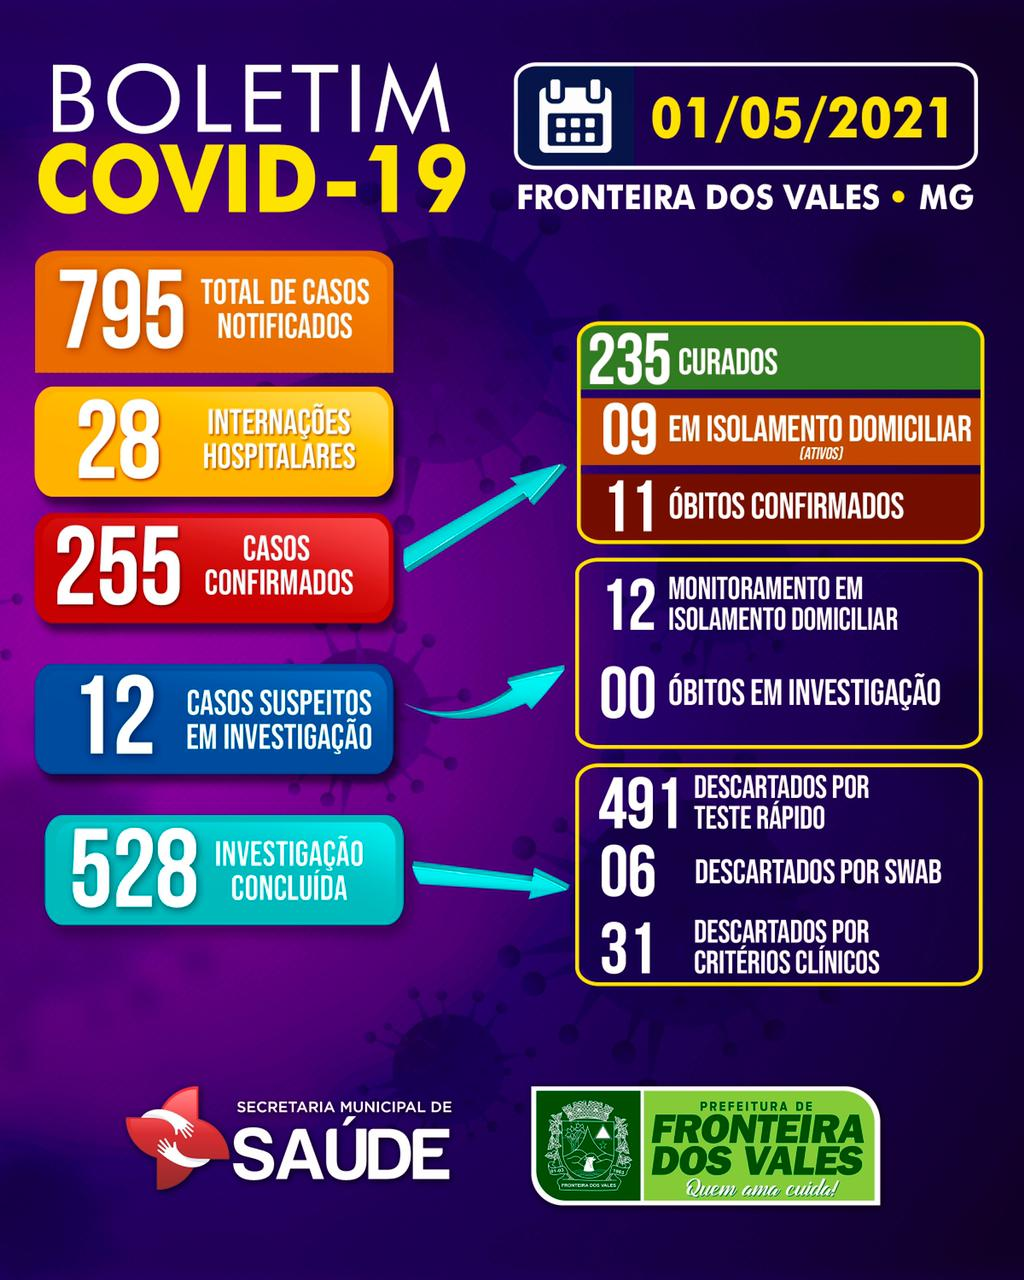 BOLETIM COVID-19 - 01/05/2021